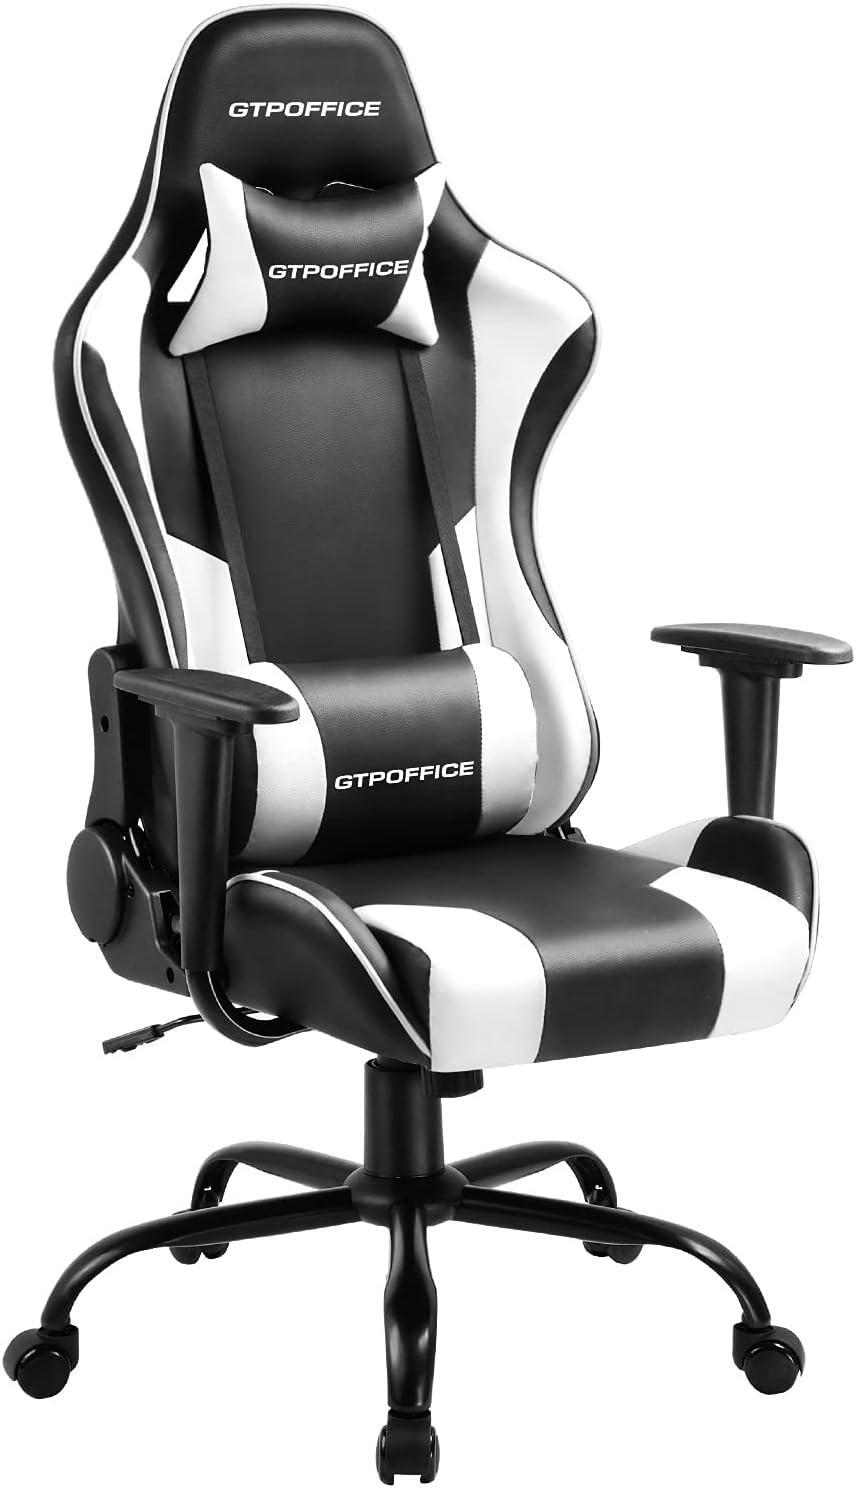 BHUTAN Gaming Chair Racing Office Chair Executive Ergonomic Swivel Task Chair PC Computer Desk Chair Reclining High Back with Retractable Arms Headrest/&Lumbar Pillows Blue, 1L